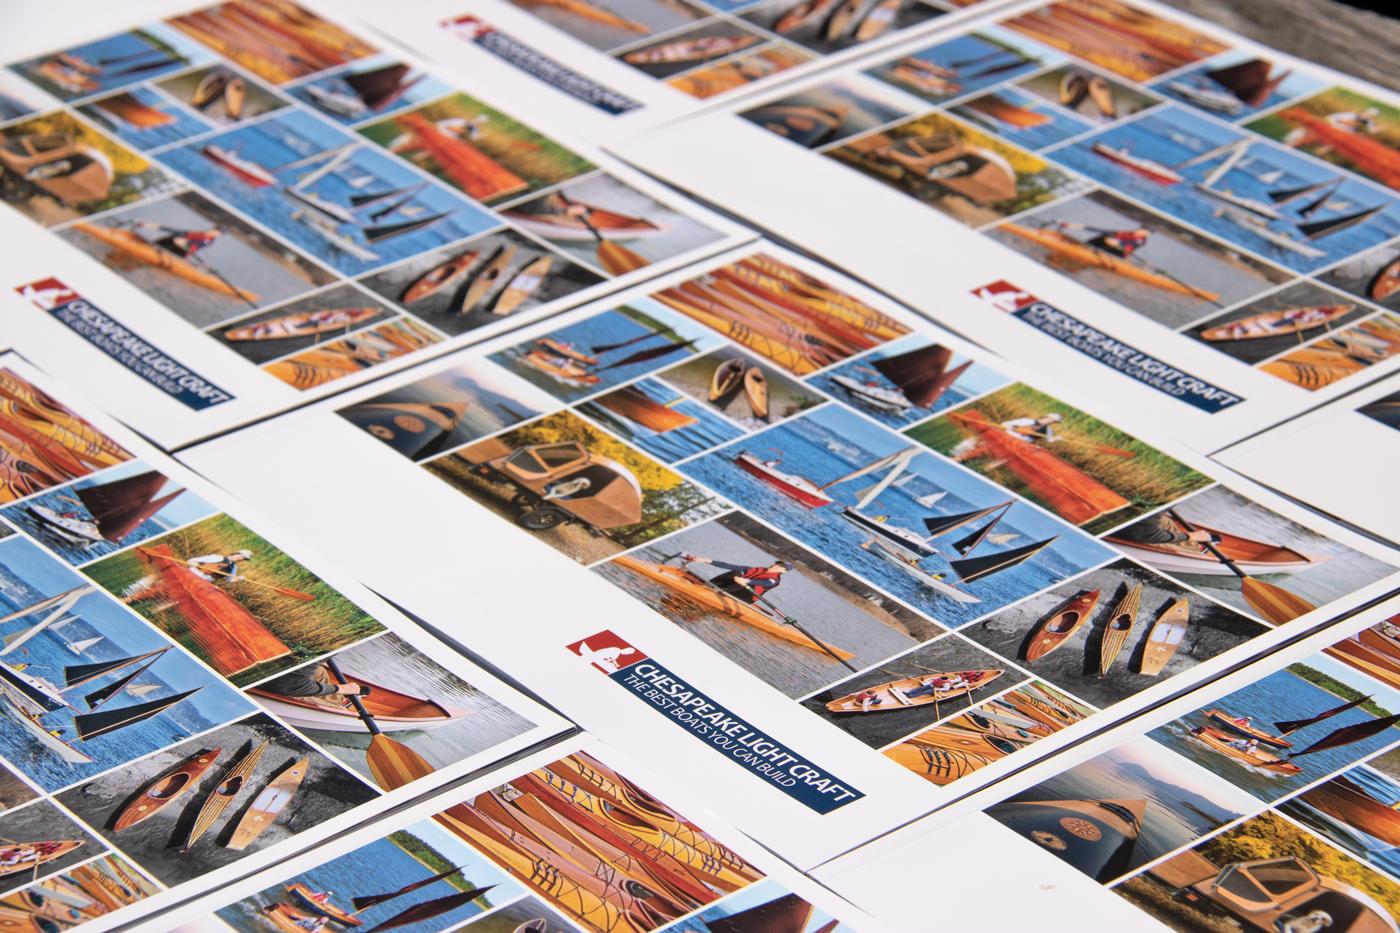 Chesapeake Light Craft's 2018 Print Catalog